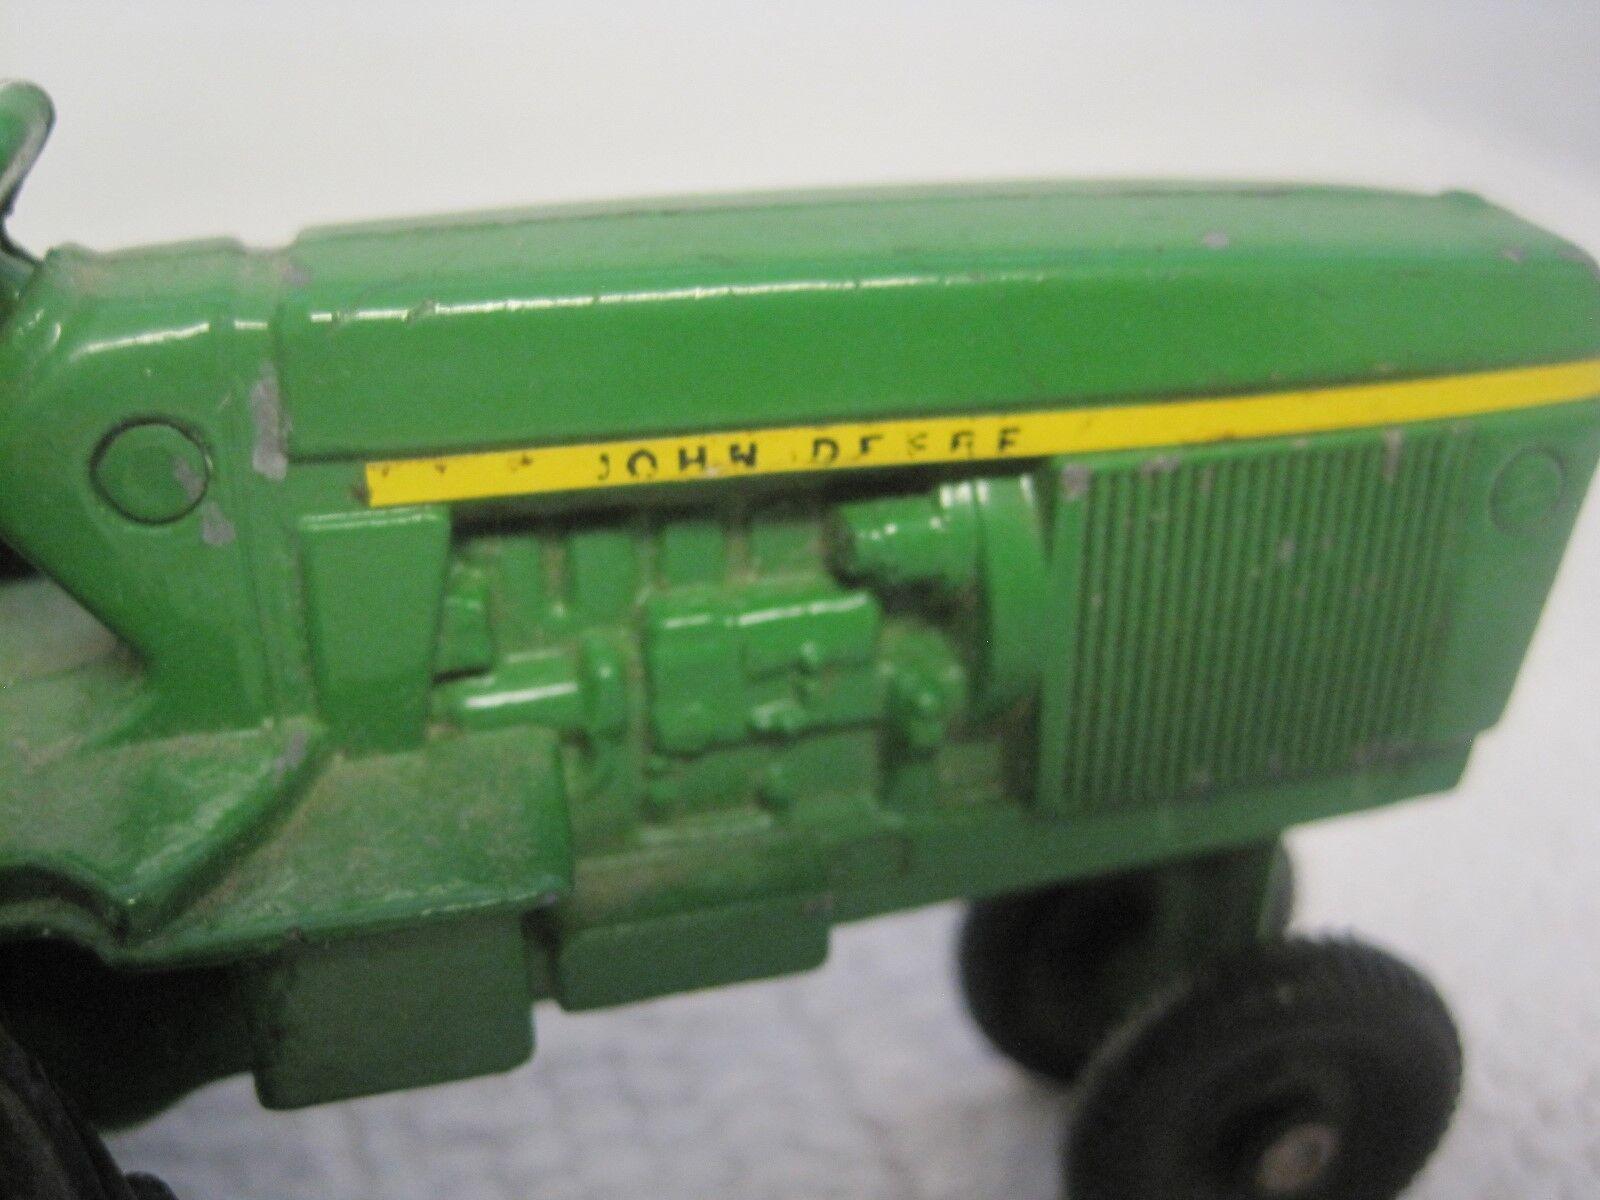 Vintage ERTL John Deere Deere Deere Narrow End High Draw Bar Tractor 1 32-USA-FAST SHIPPING  60c38b